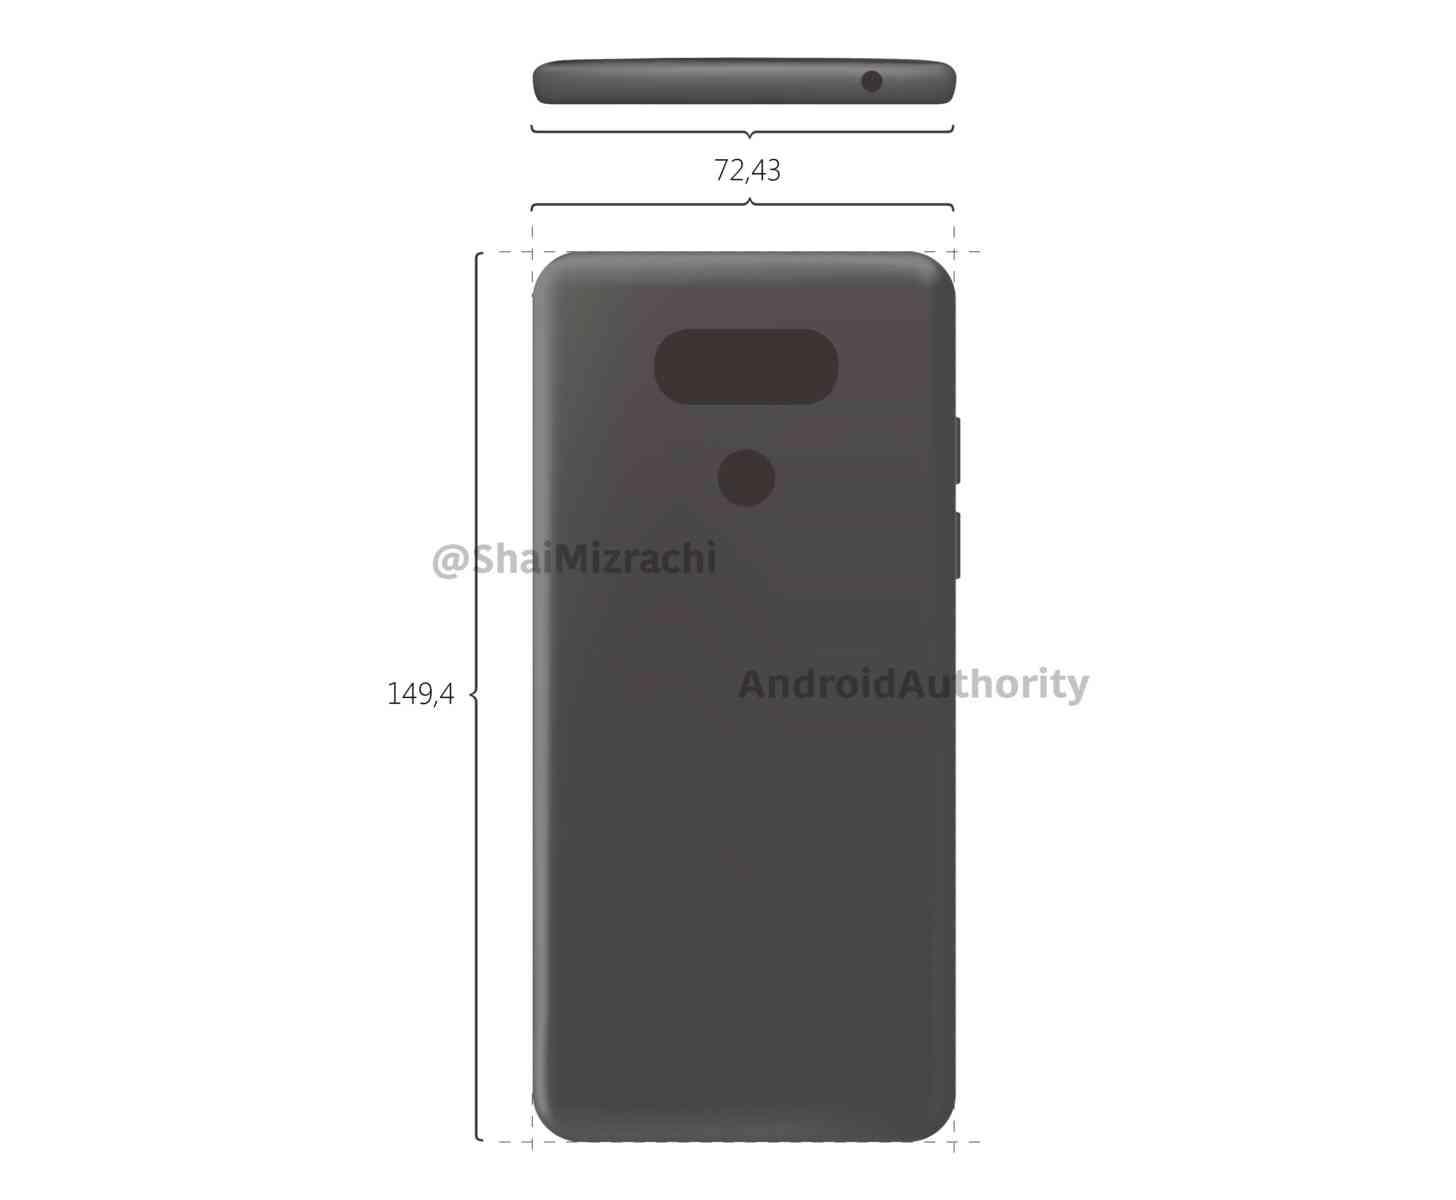 LG G6 design leak